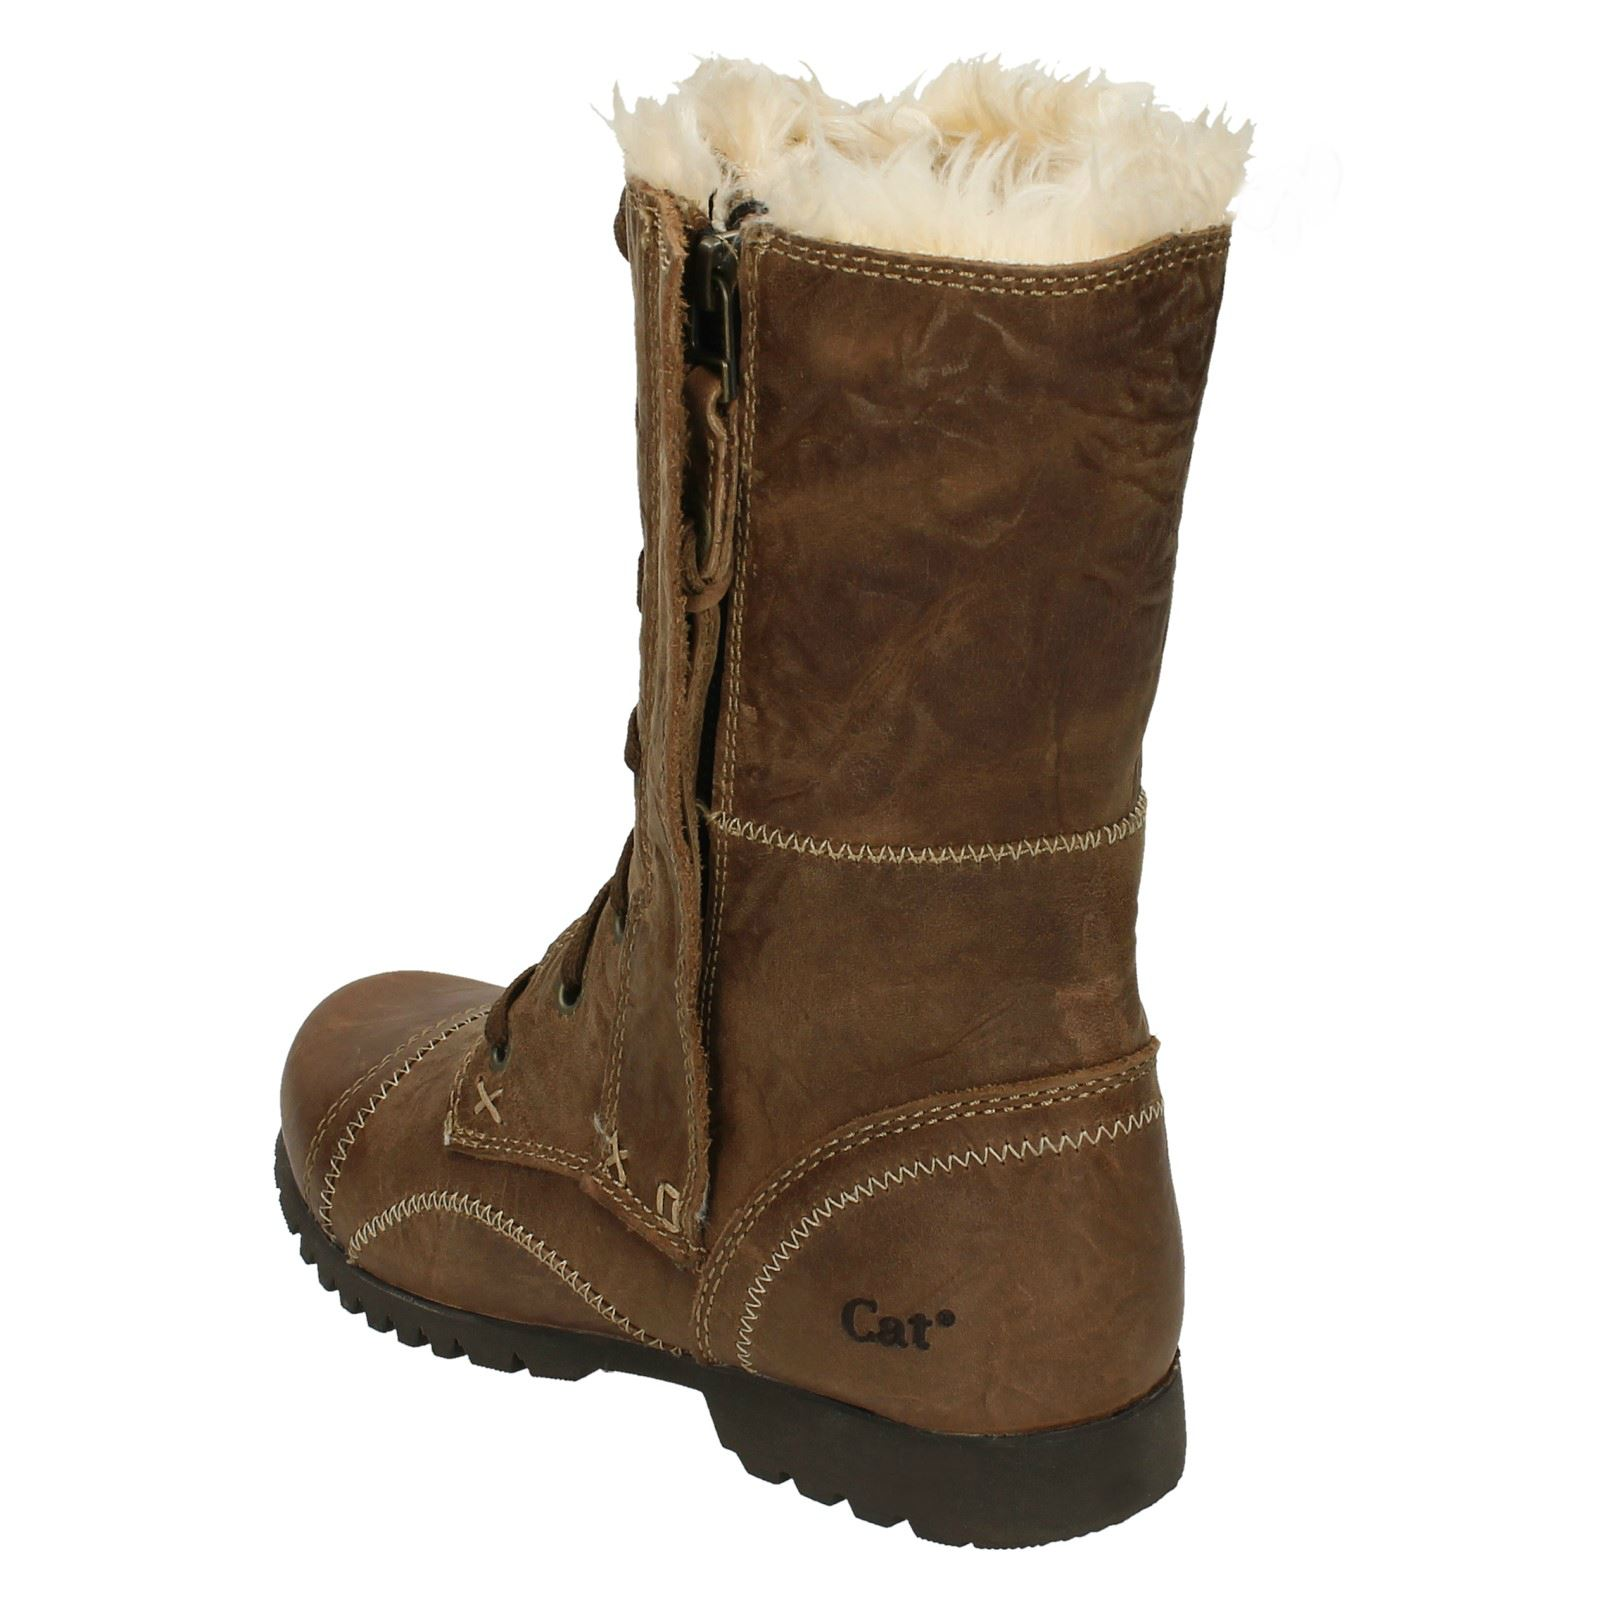 a735da31a002 Ladies Legendary Raw By Caterpillar Fur Lined Boots Jane Fur